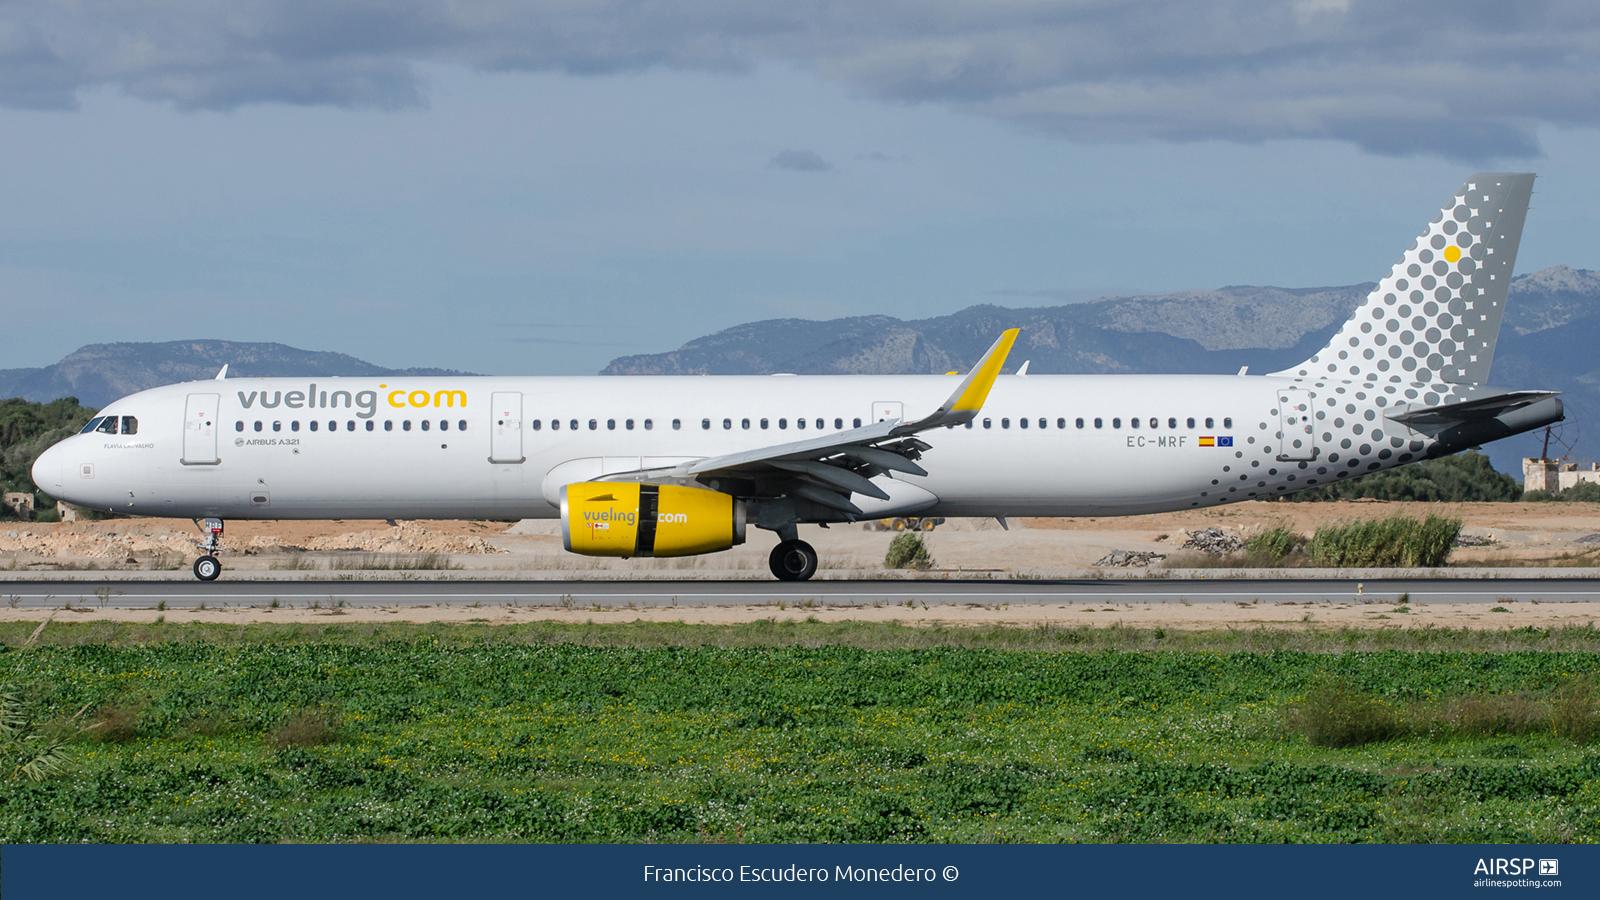 VuelingAirbus A321EC-MRF